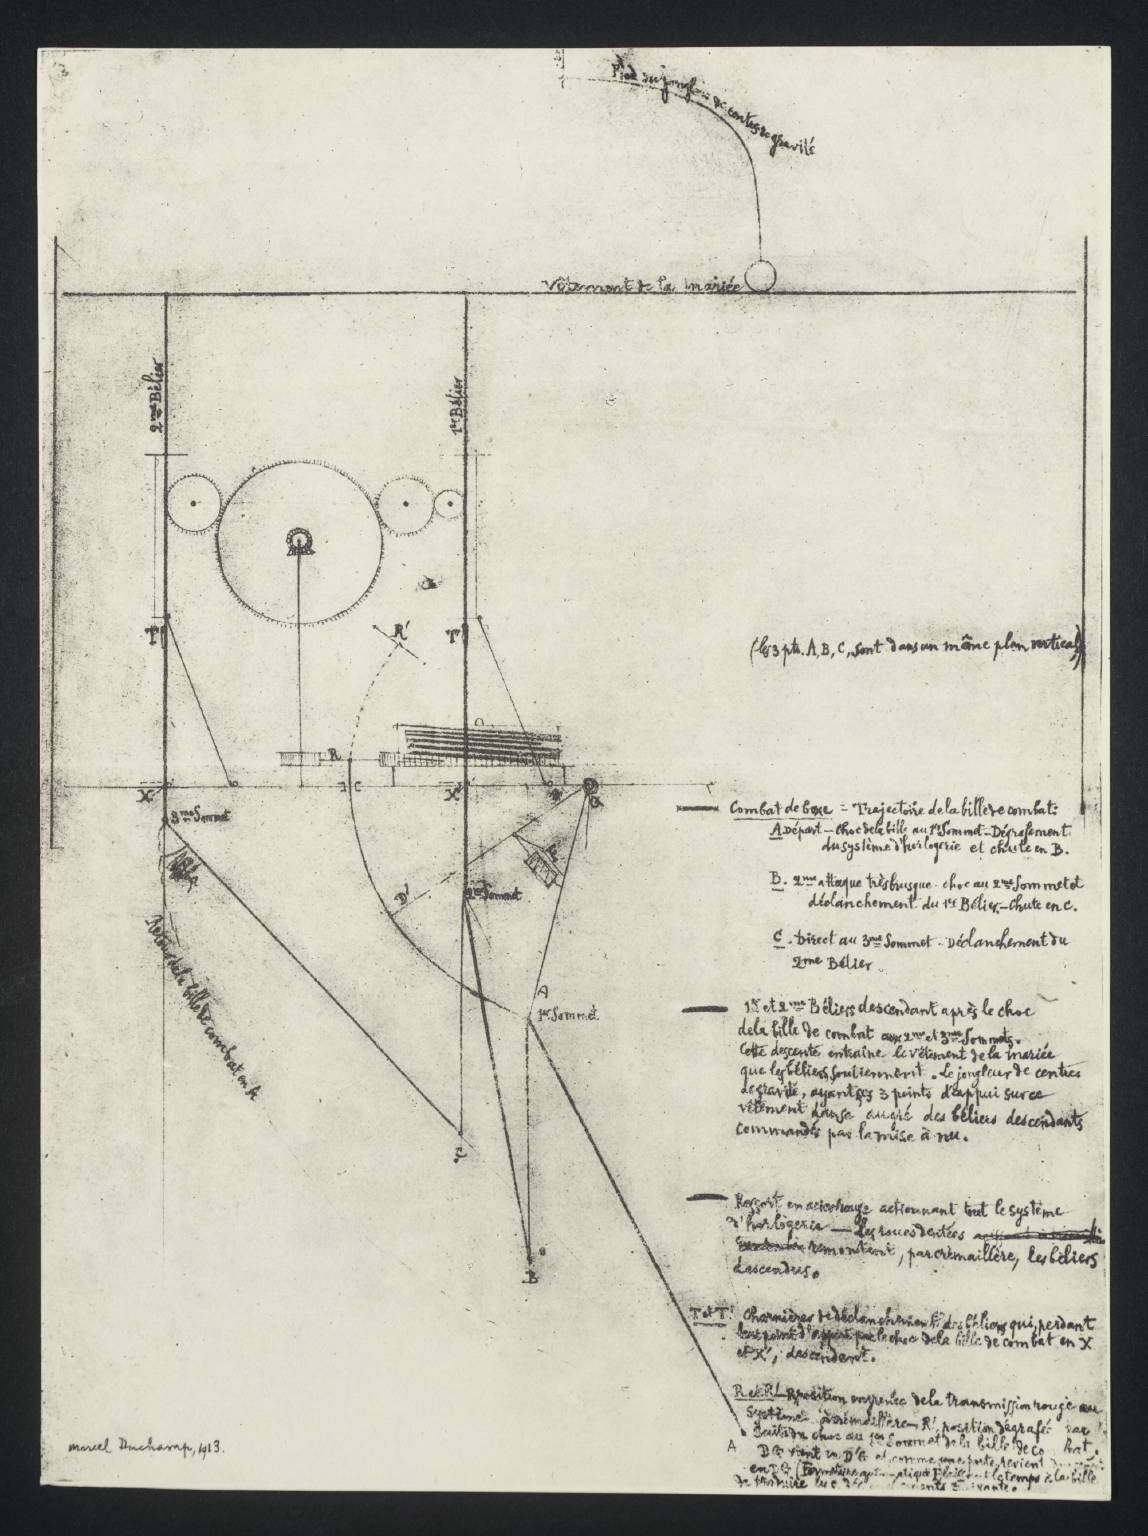 Marcel Duchamp, 1913